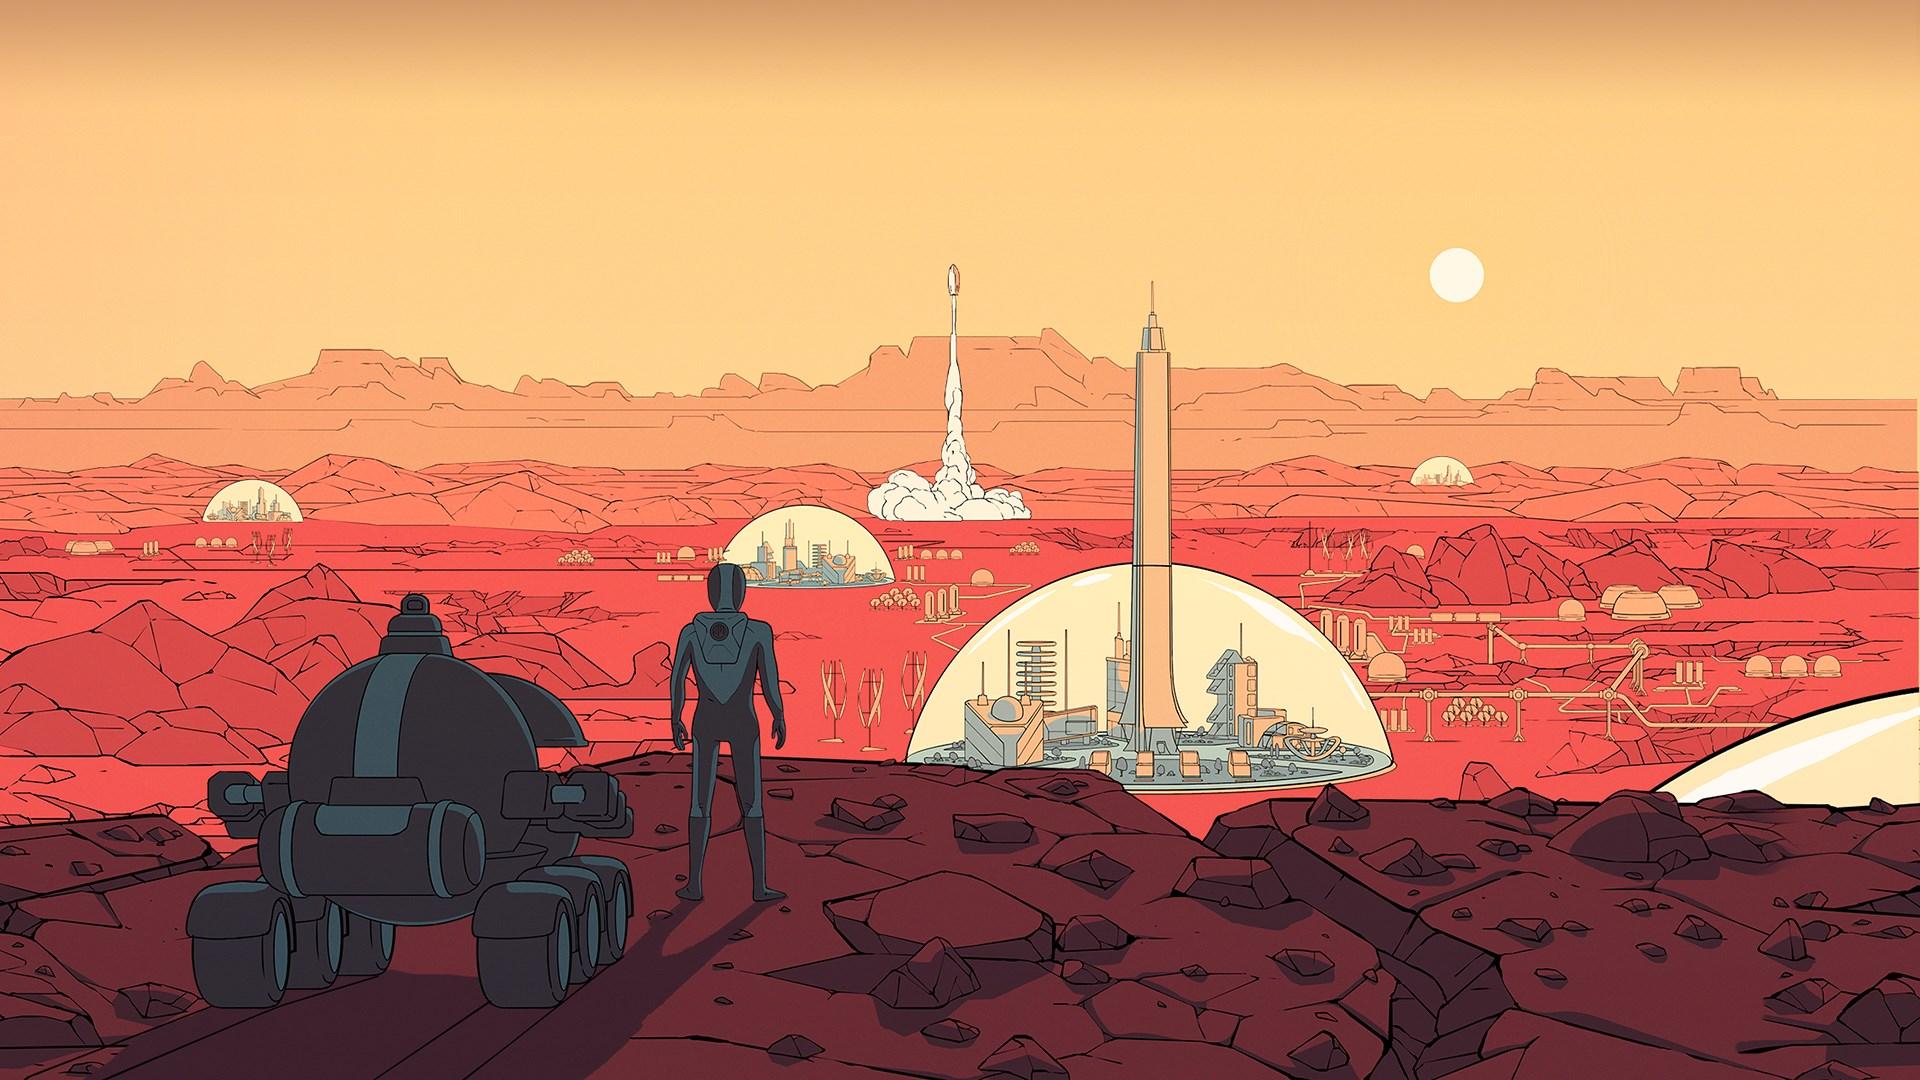 Халява: на PC бесплатно раздают фантастическую игру про Марс — Surviving Mars